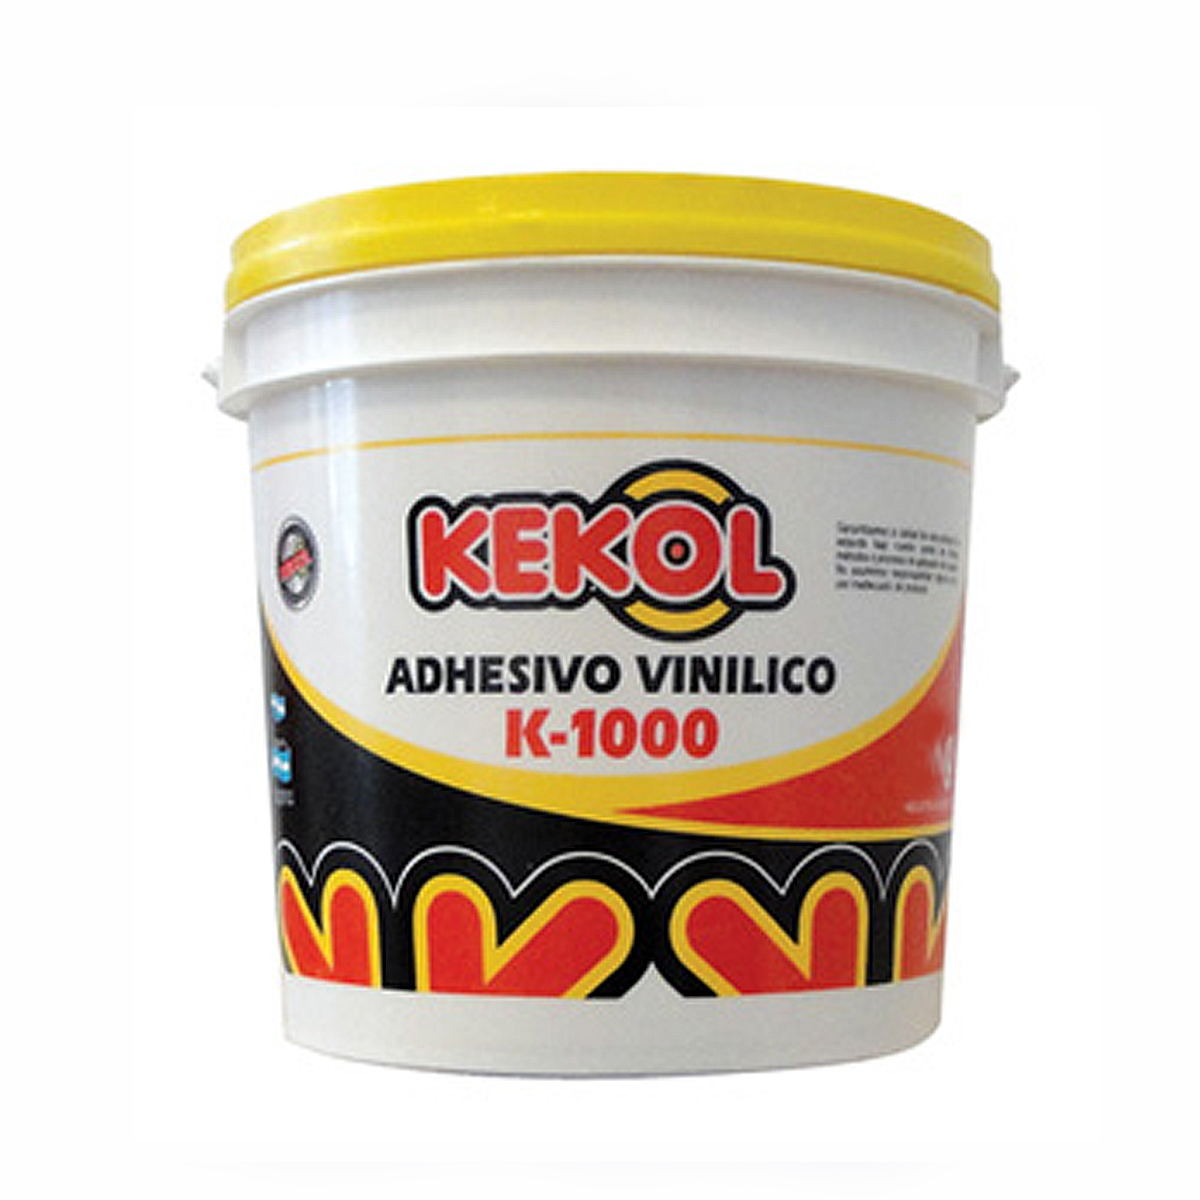 ADHESIVO VINILICO K 1000/4 KG